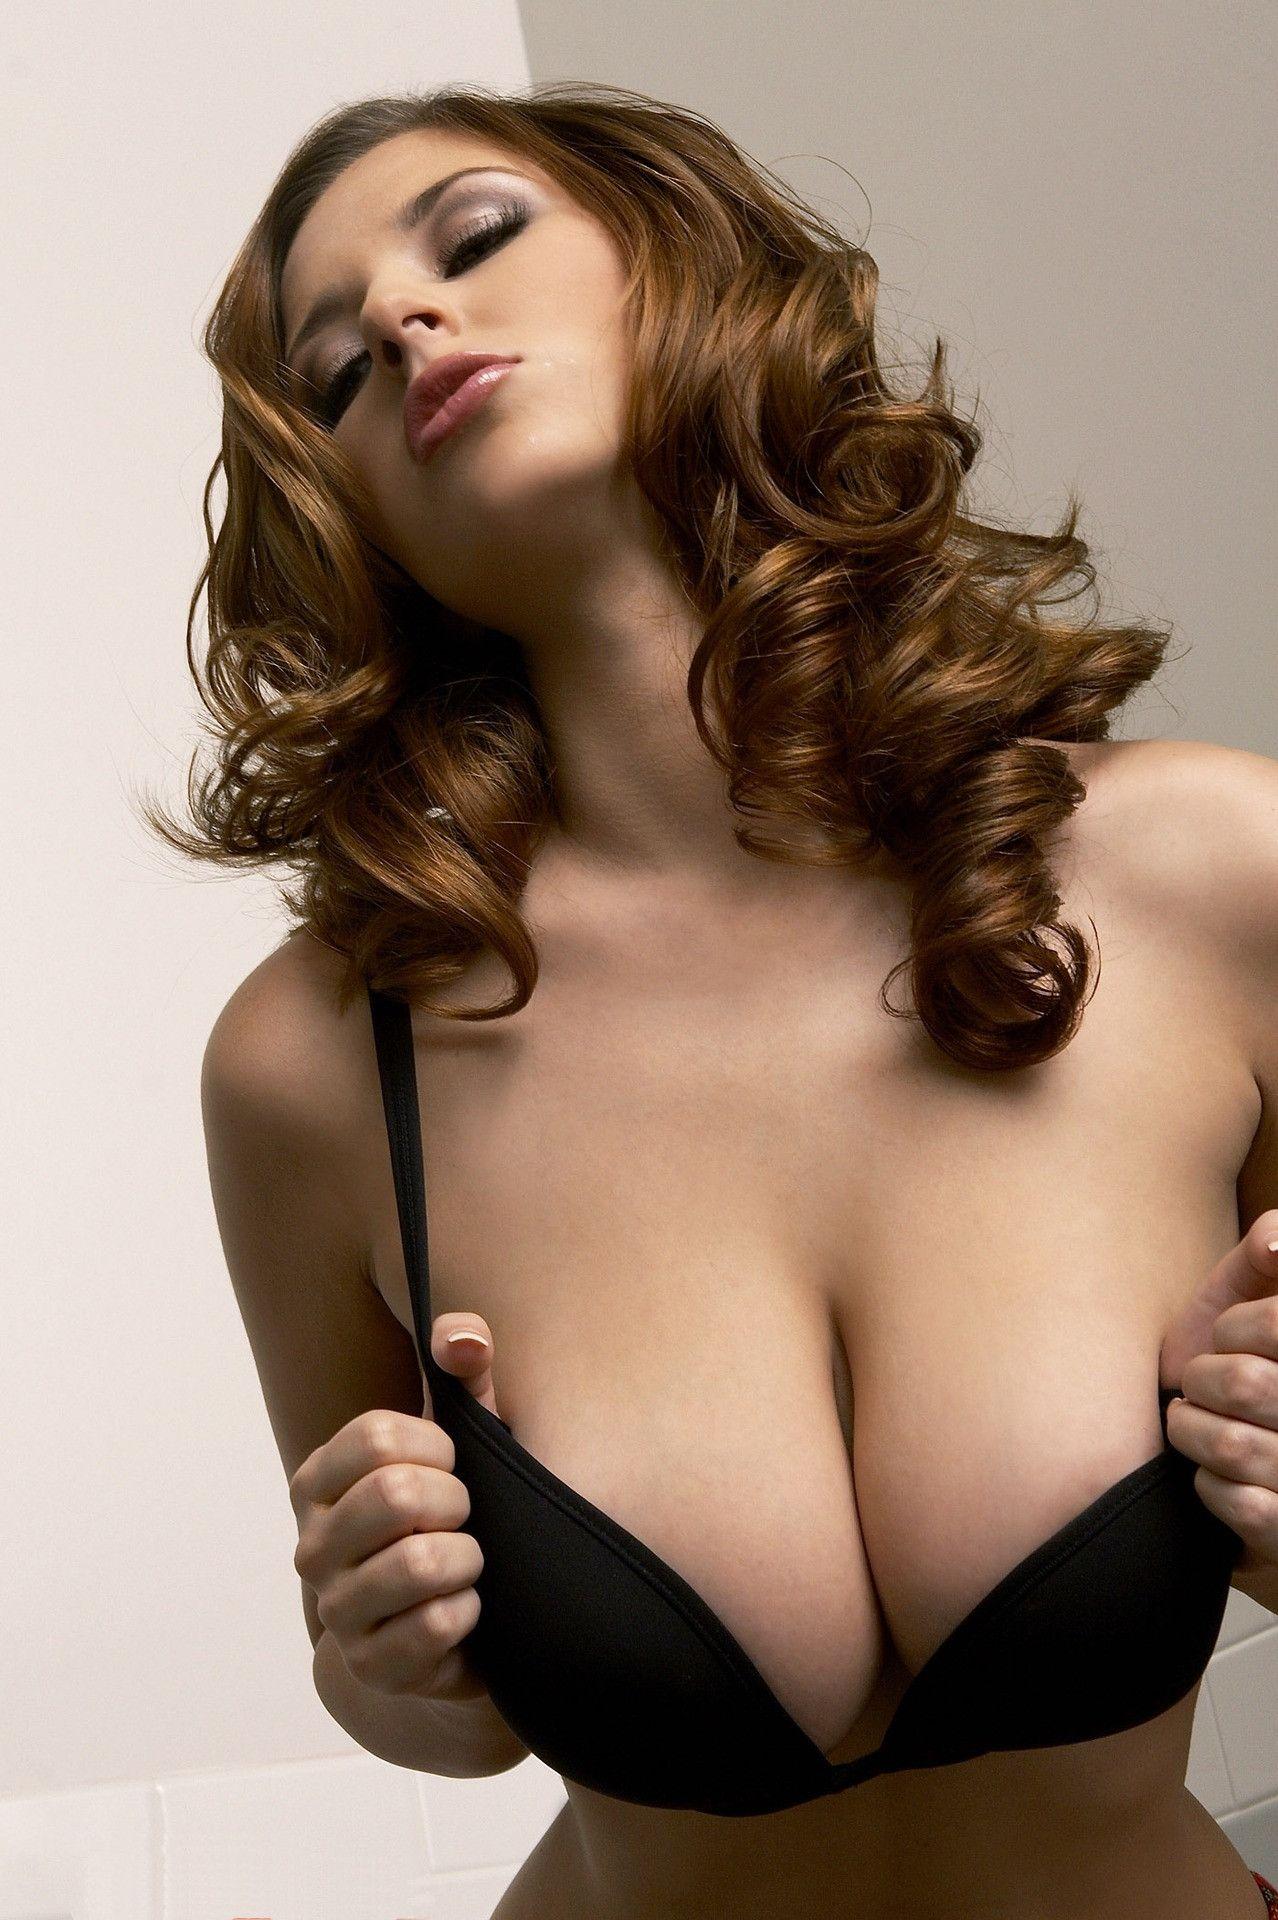 Olivia munn social media pics Sex clip CelebGate Anna Sedokova,Bella Hadid Upskirt. 2018-2019 celebrityes photos leaks!